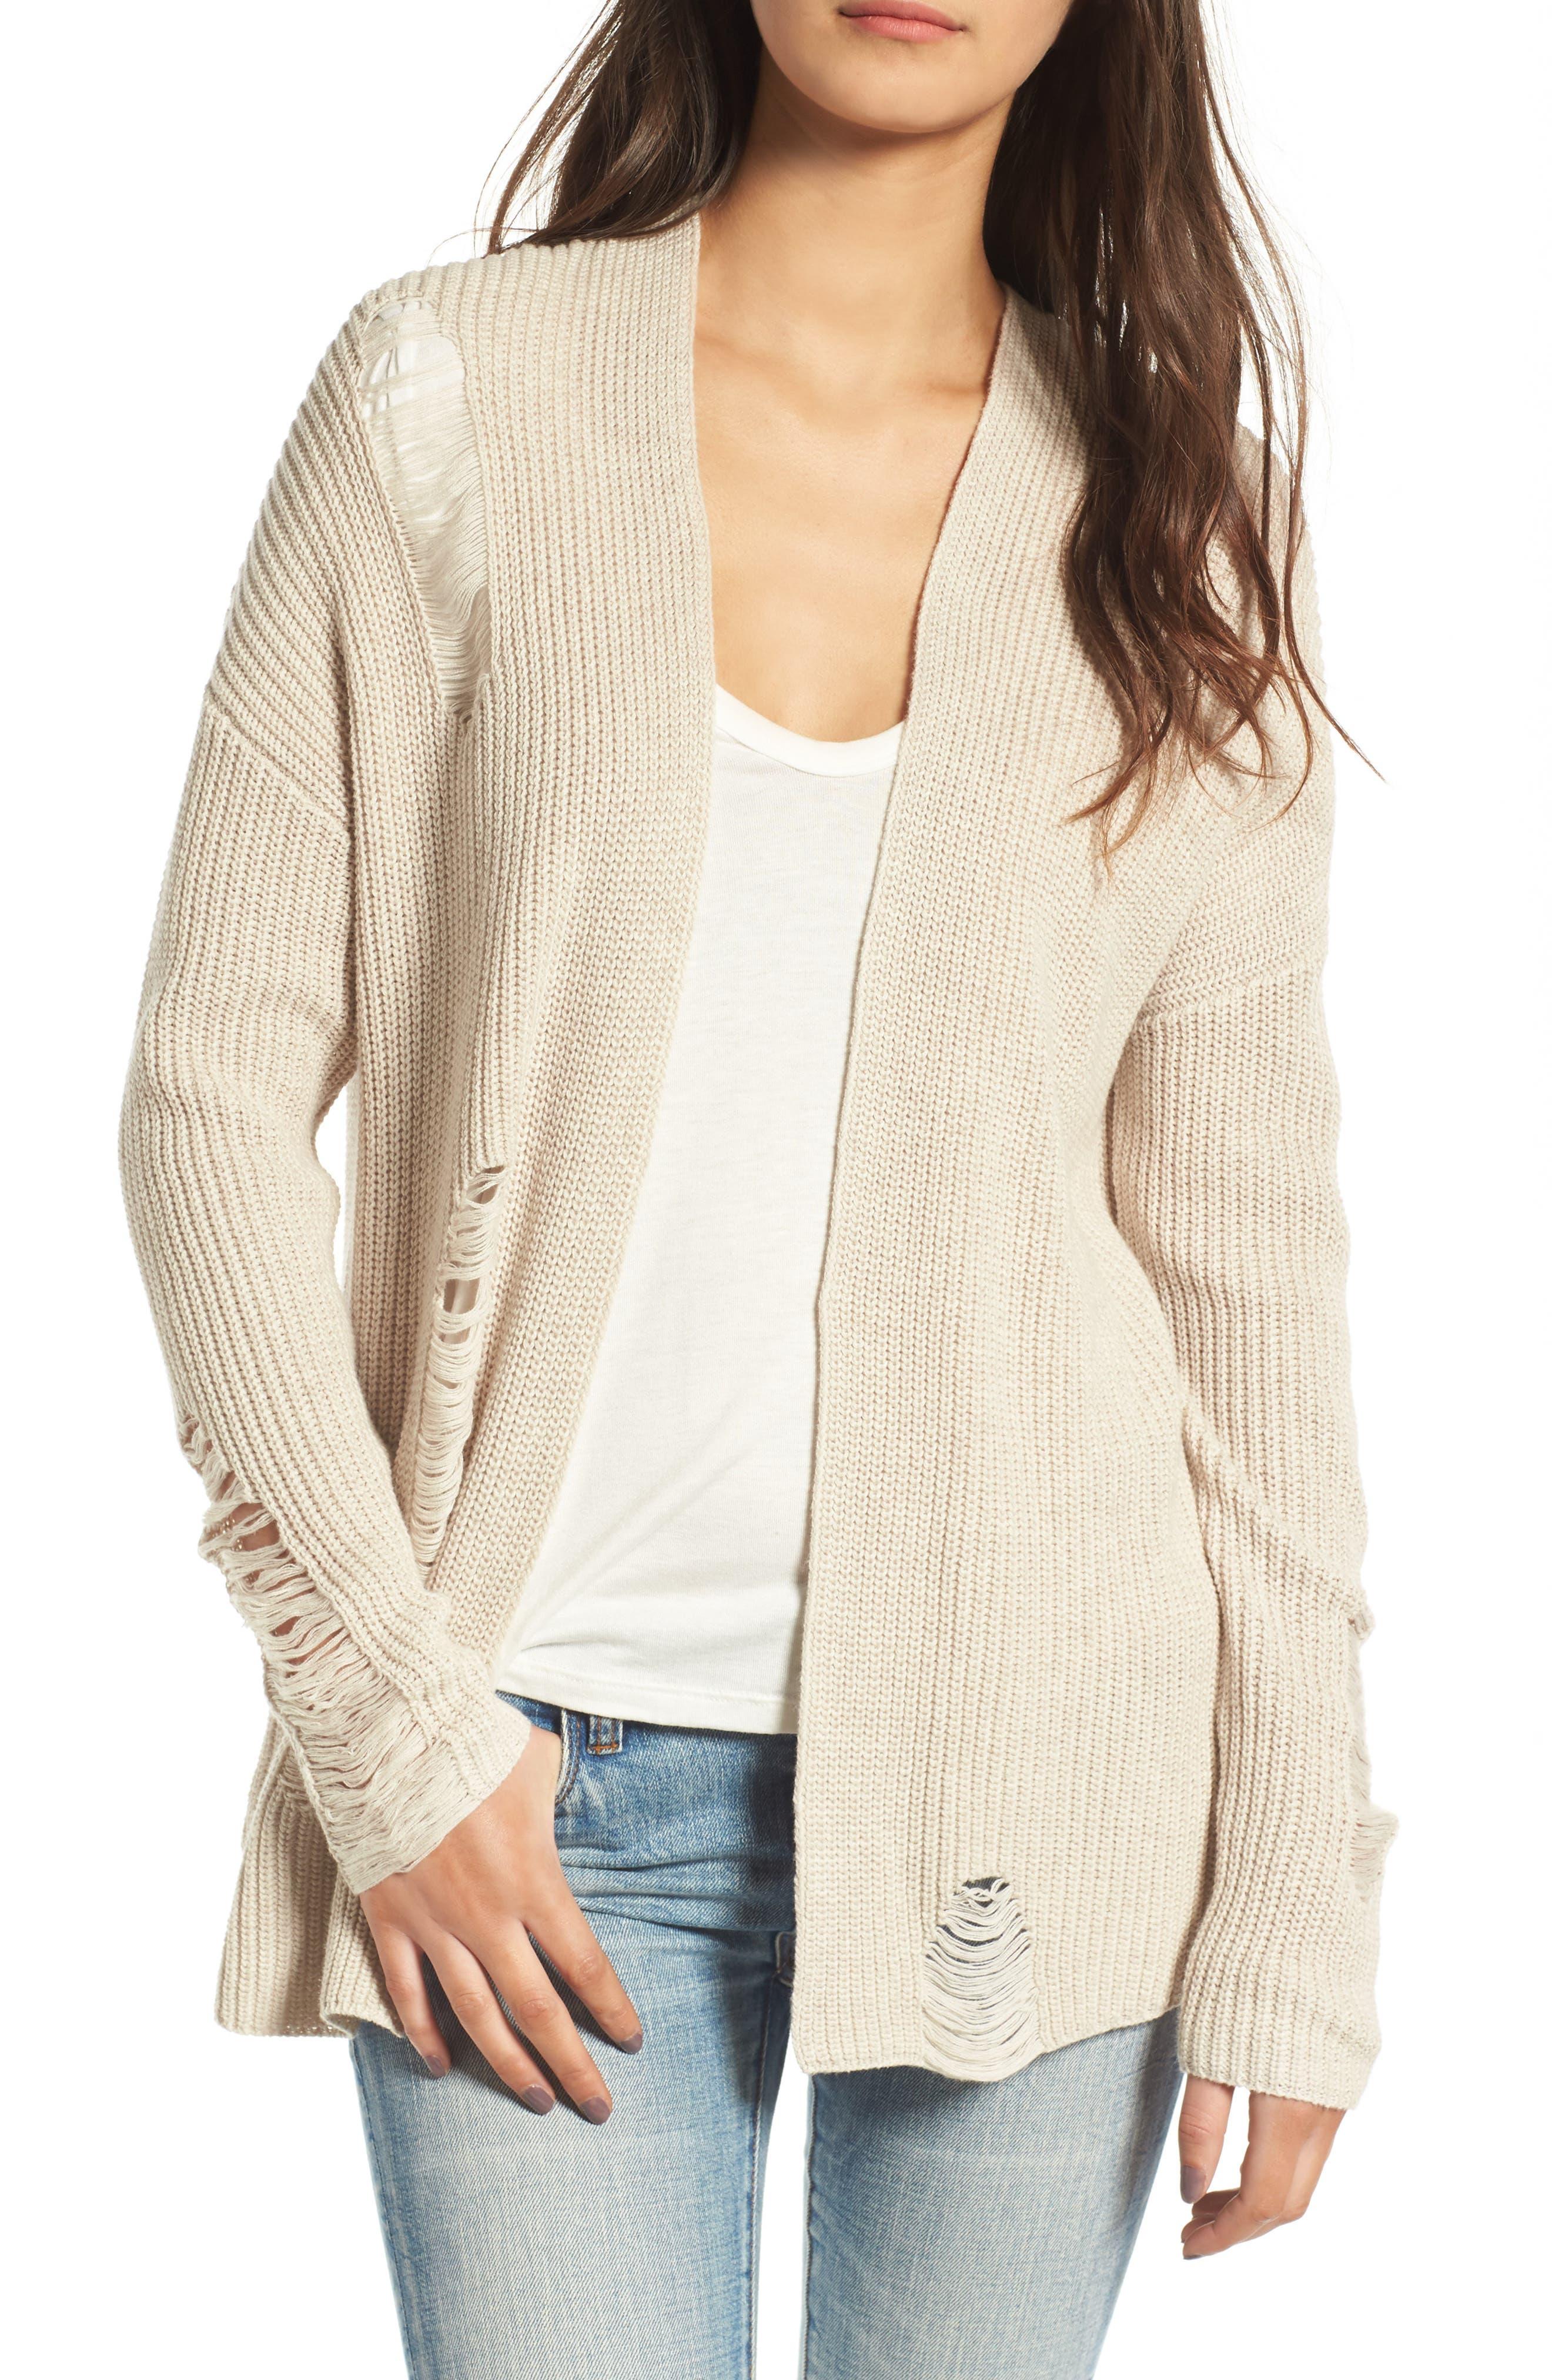 Alternate Image 1 Selected - BP. Distressed Cotton Cardigan